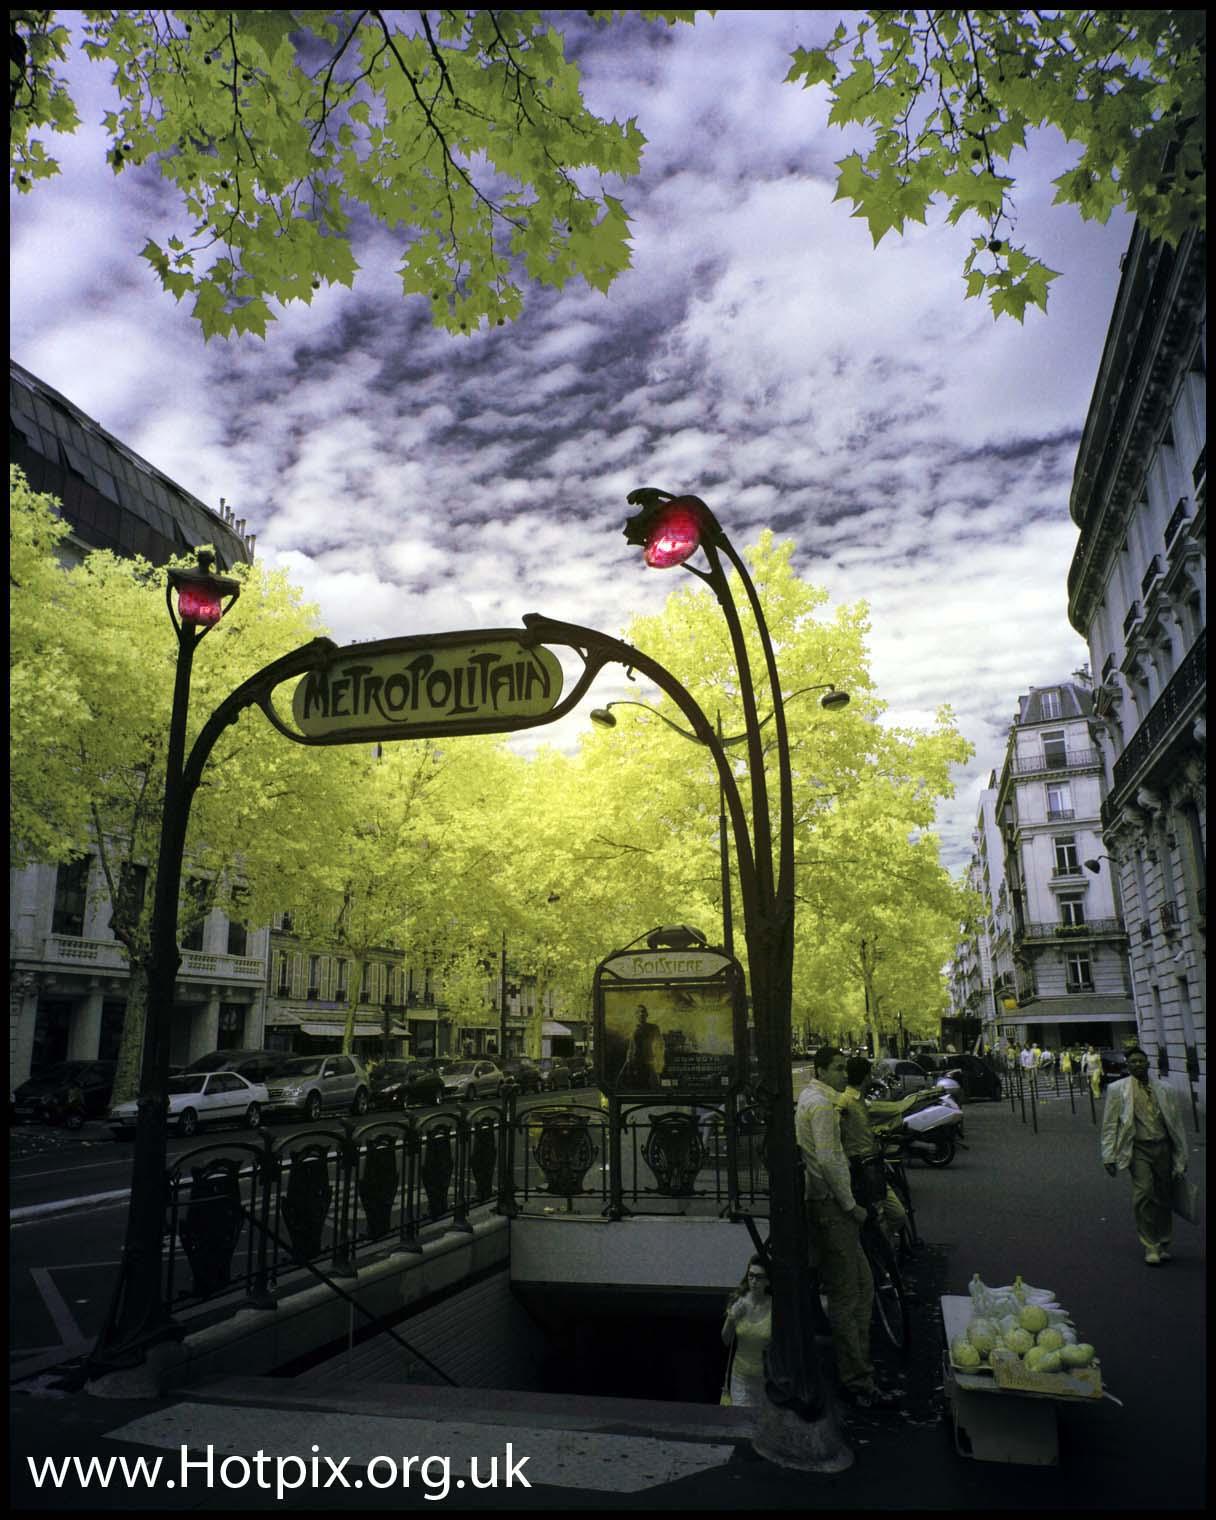 IR,Framnce,French,infrared,infra,red,parisian,metro,station,art,summer,HDR,tony,smith,tonysmith,hotpix,tonysmithhotpix,hot,pics,pix,FR,line,lines,@hotpixuk